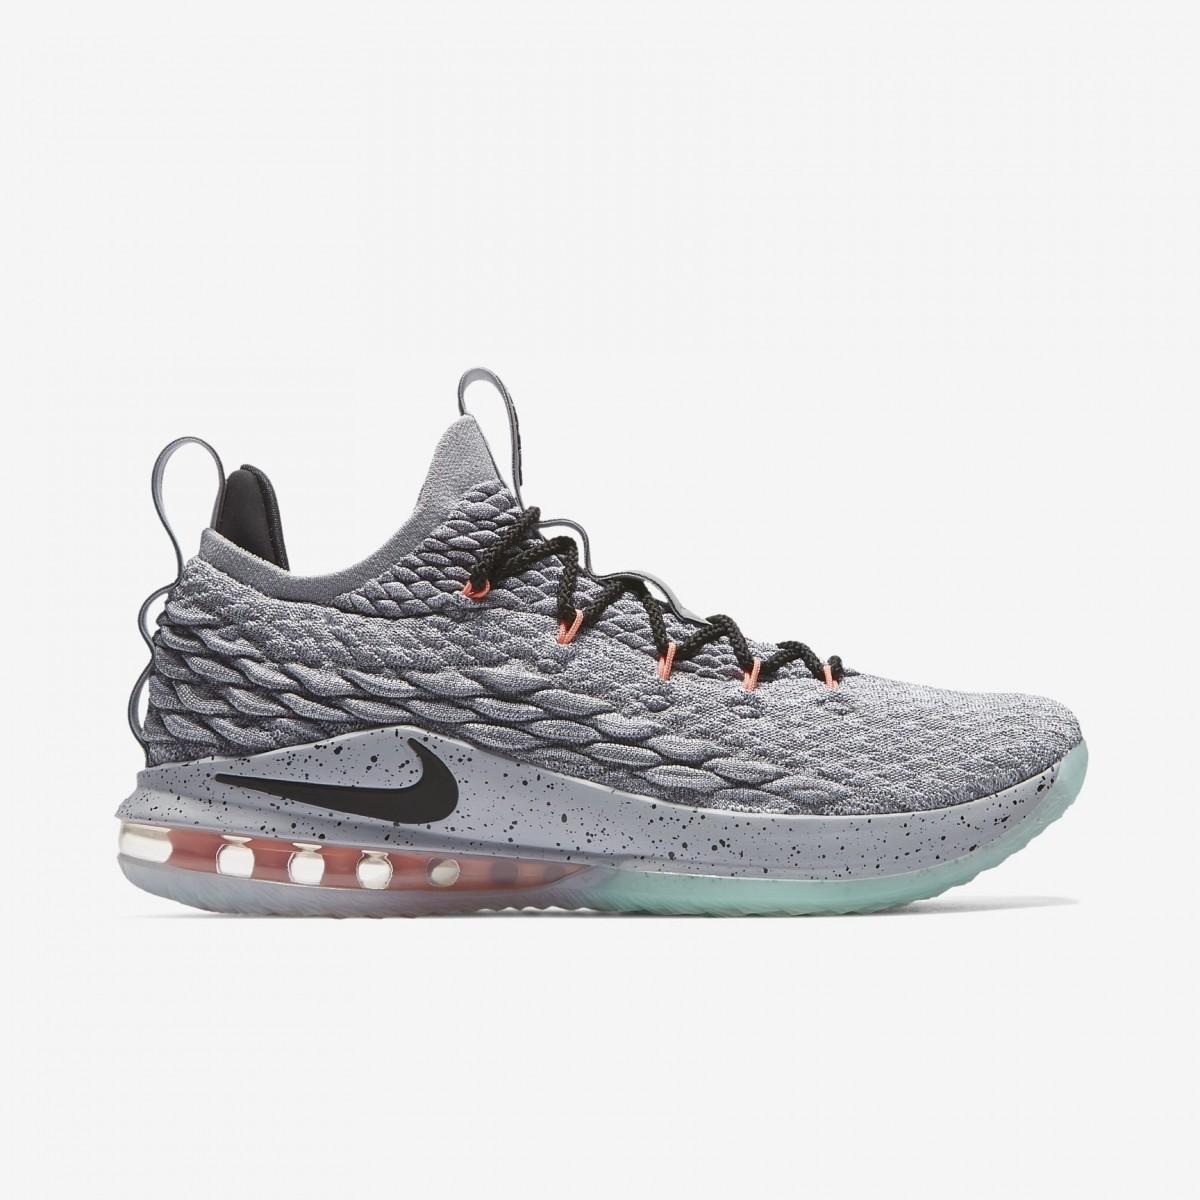 Nike Lebron XV Low 'Flight Pack'